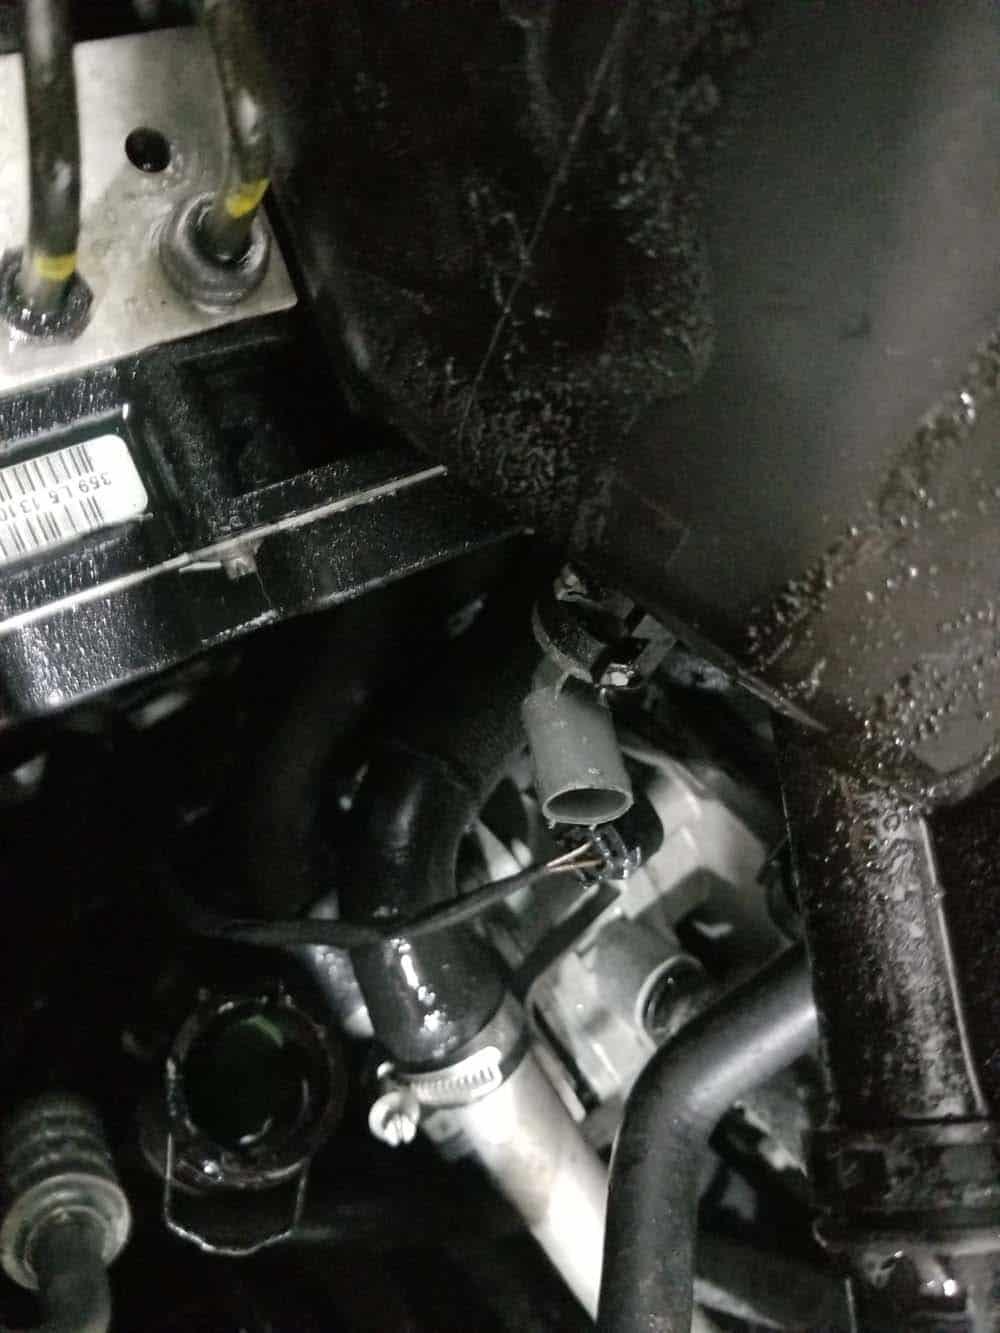 Unplug the electrical sensor on bottom of the tank.